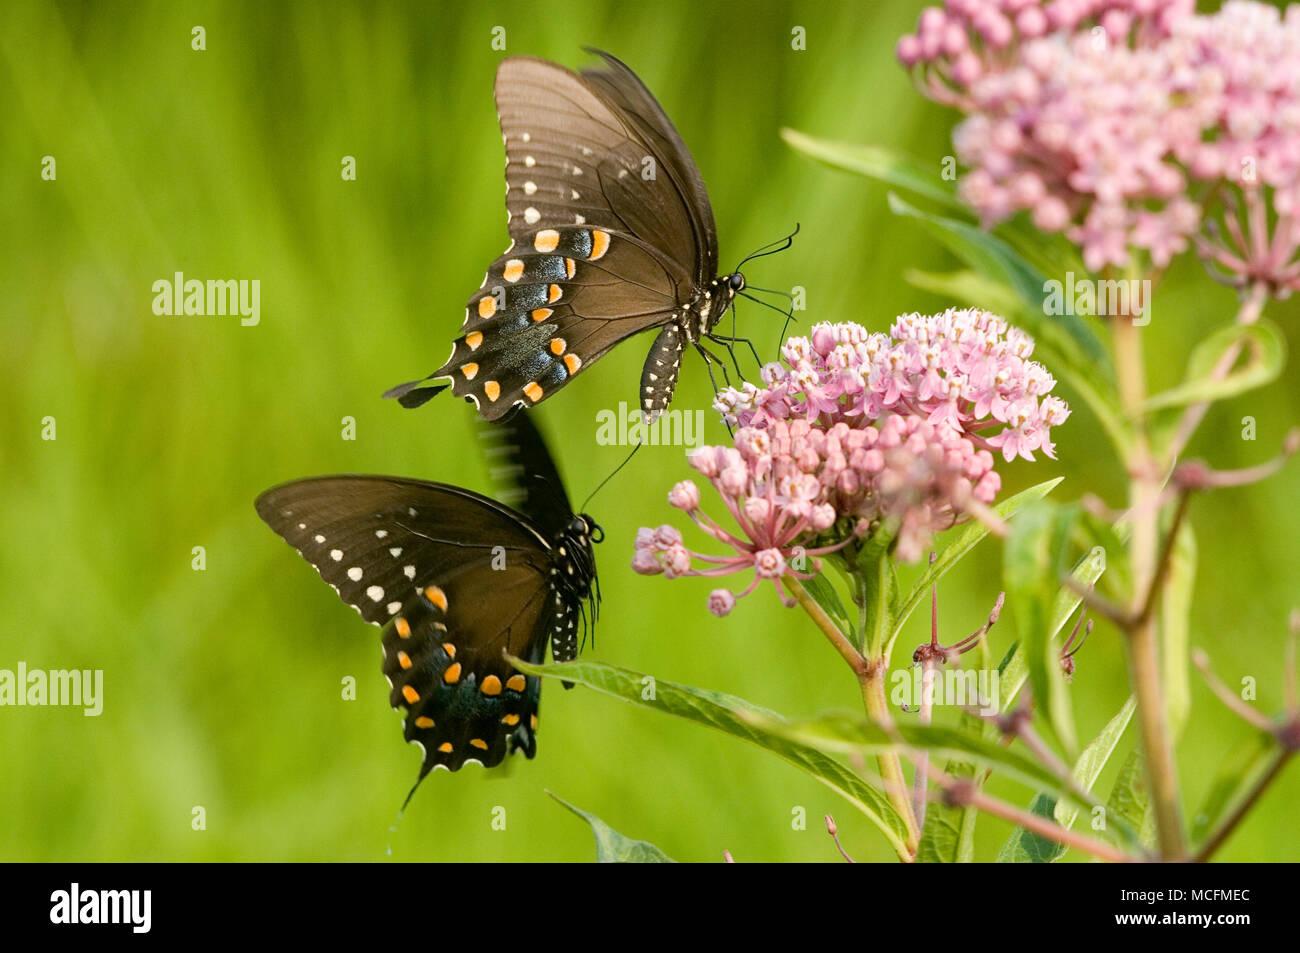 03029-013.03 Swallowtails Spicebush (Papilio Troilo) macho y hembra comportamiento de cortejo cerca de pantano (Asclepias Asclepias incarnata) Marion Co. IL Foto de stock